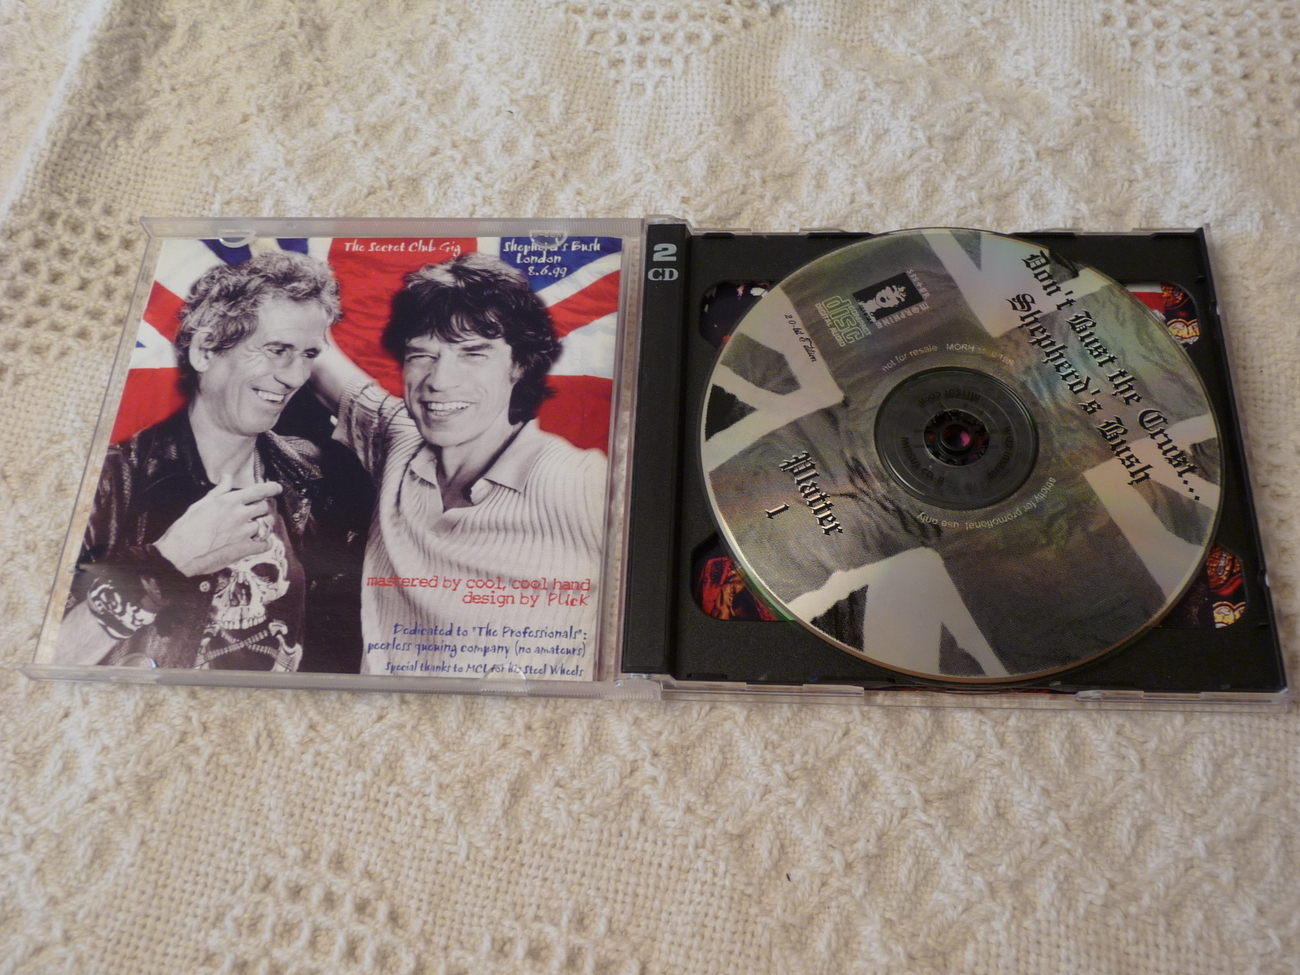 The Rolling Stones DON'T Bite The Crust Shepards Bush 1999 Original Vintage 2 cd